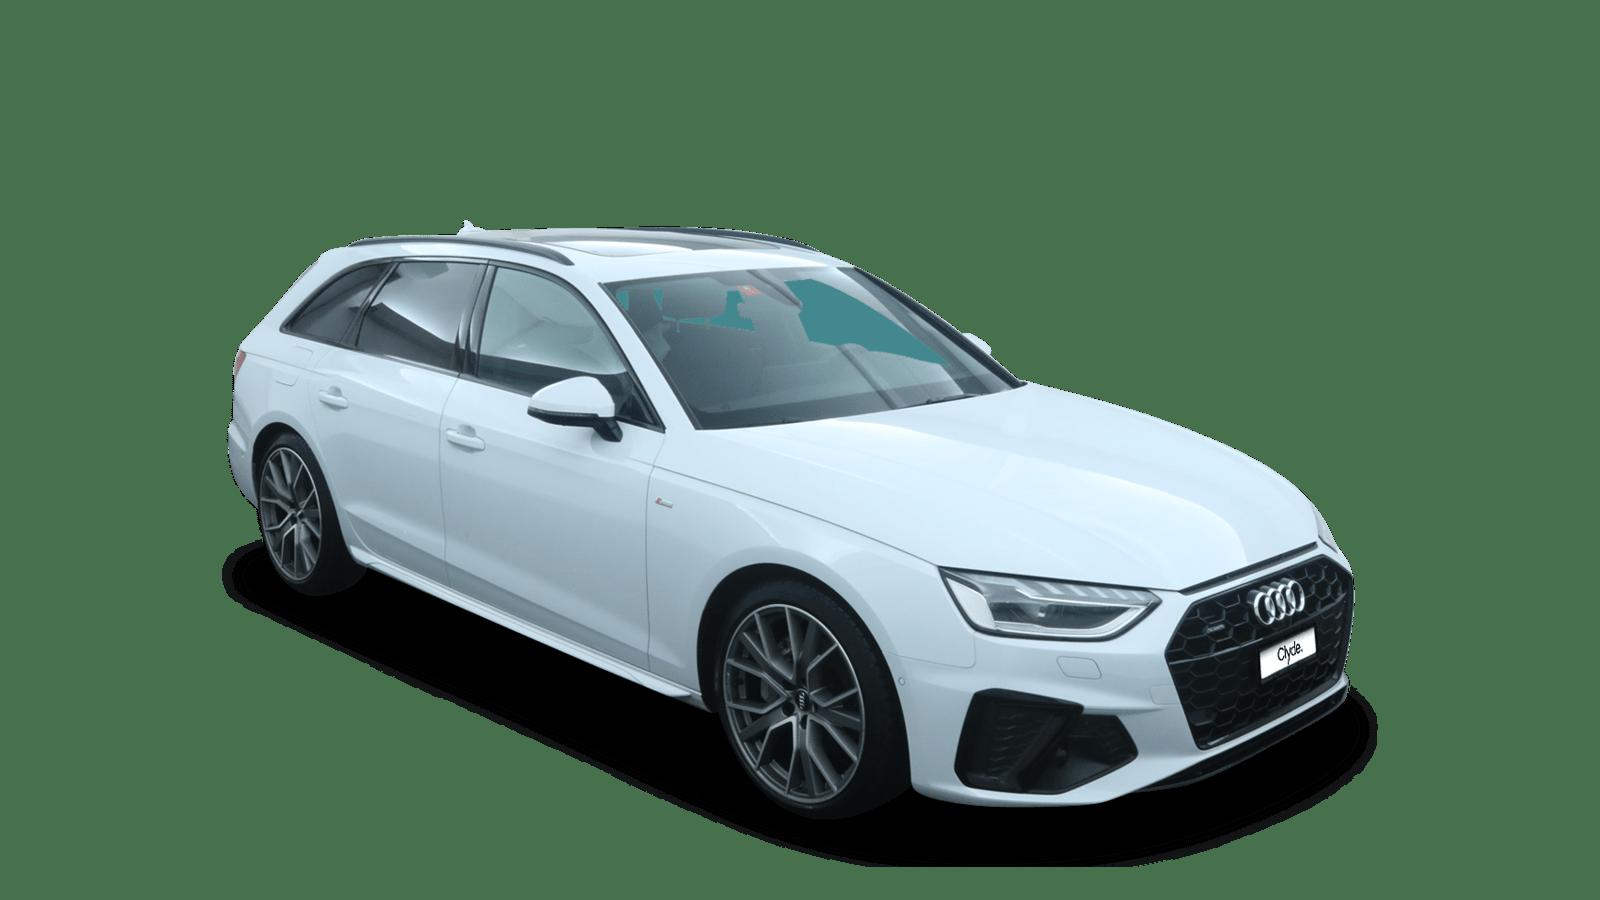 Audi A4 Avant White front - Clyde car subscription